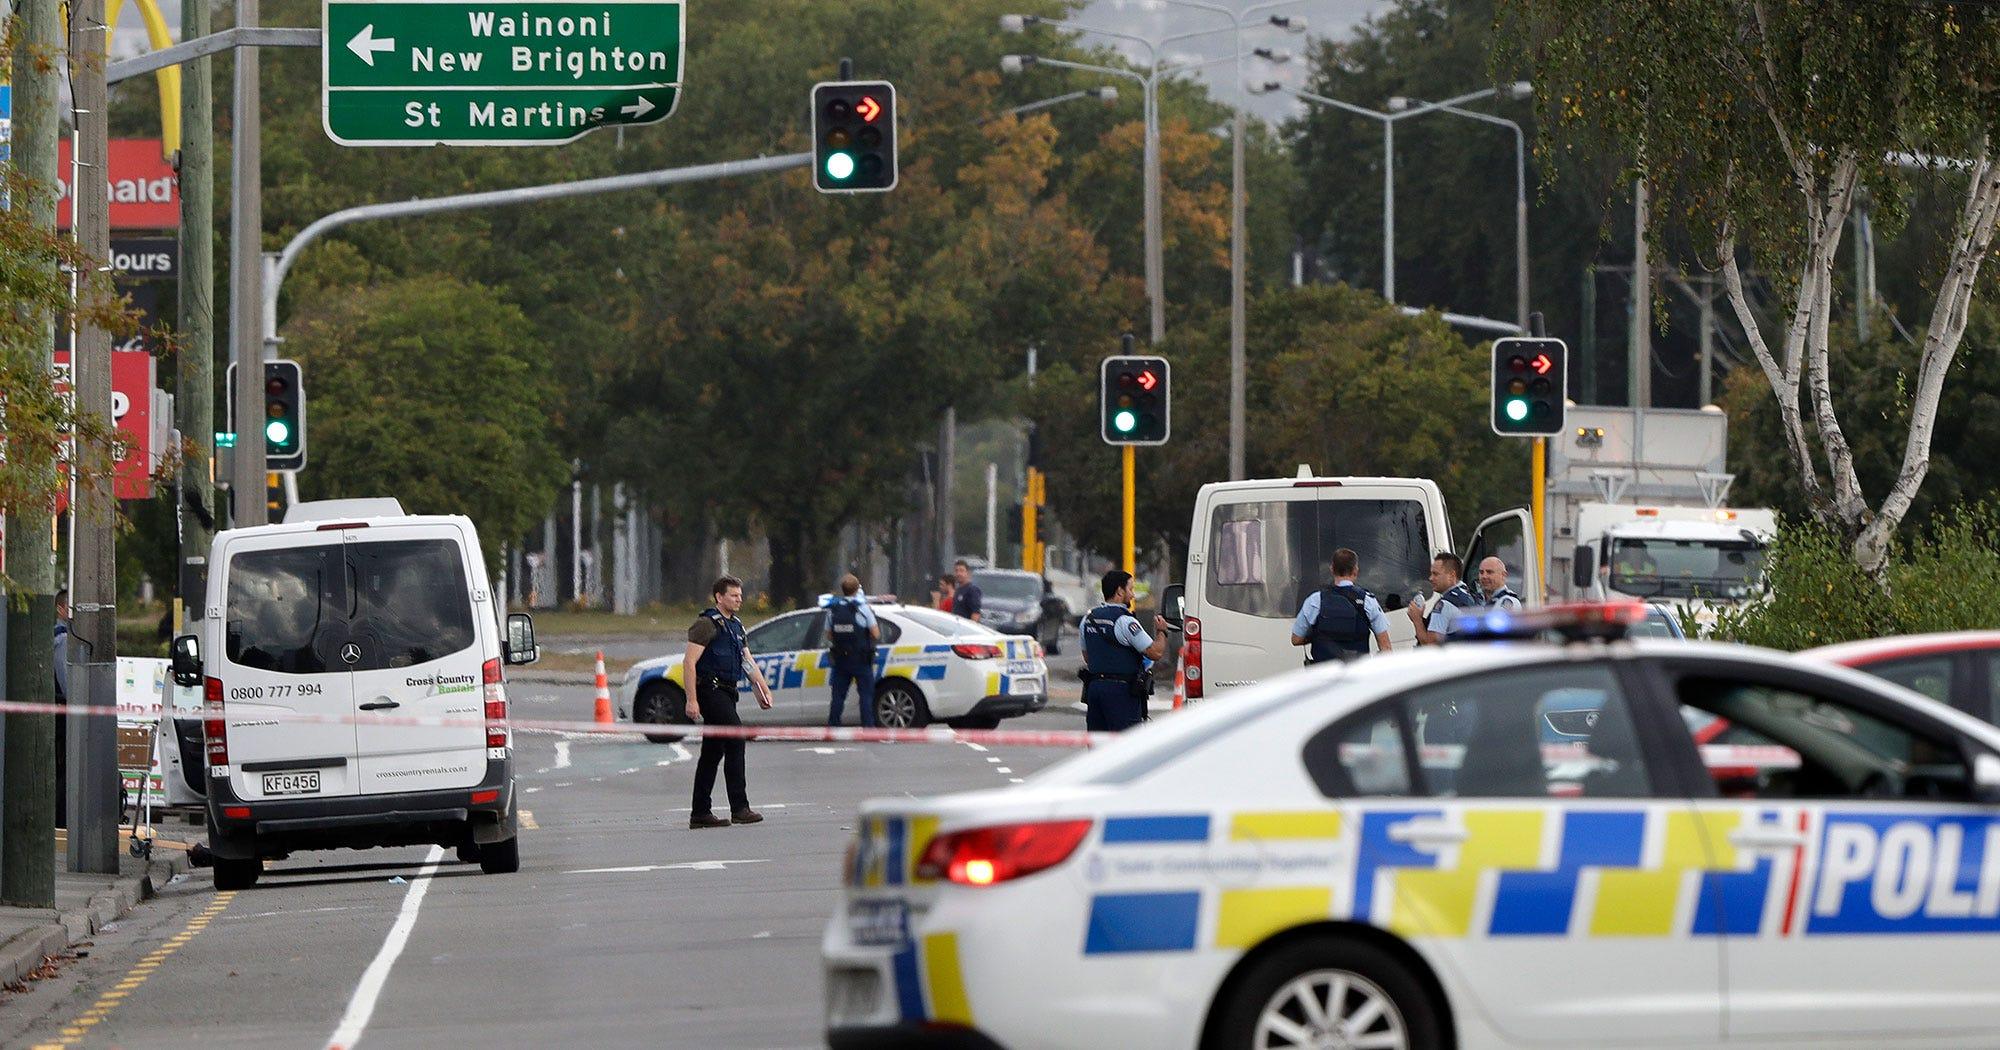 Christchurch Mosque Shooting 49 Dead In Terror Attack In: New Zealand Terrorist Mosque Shootings Leaves 49 Dead